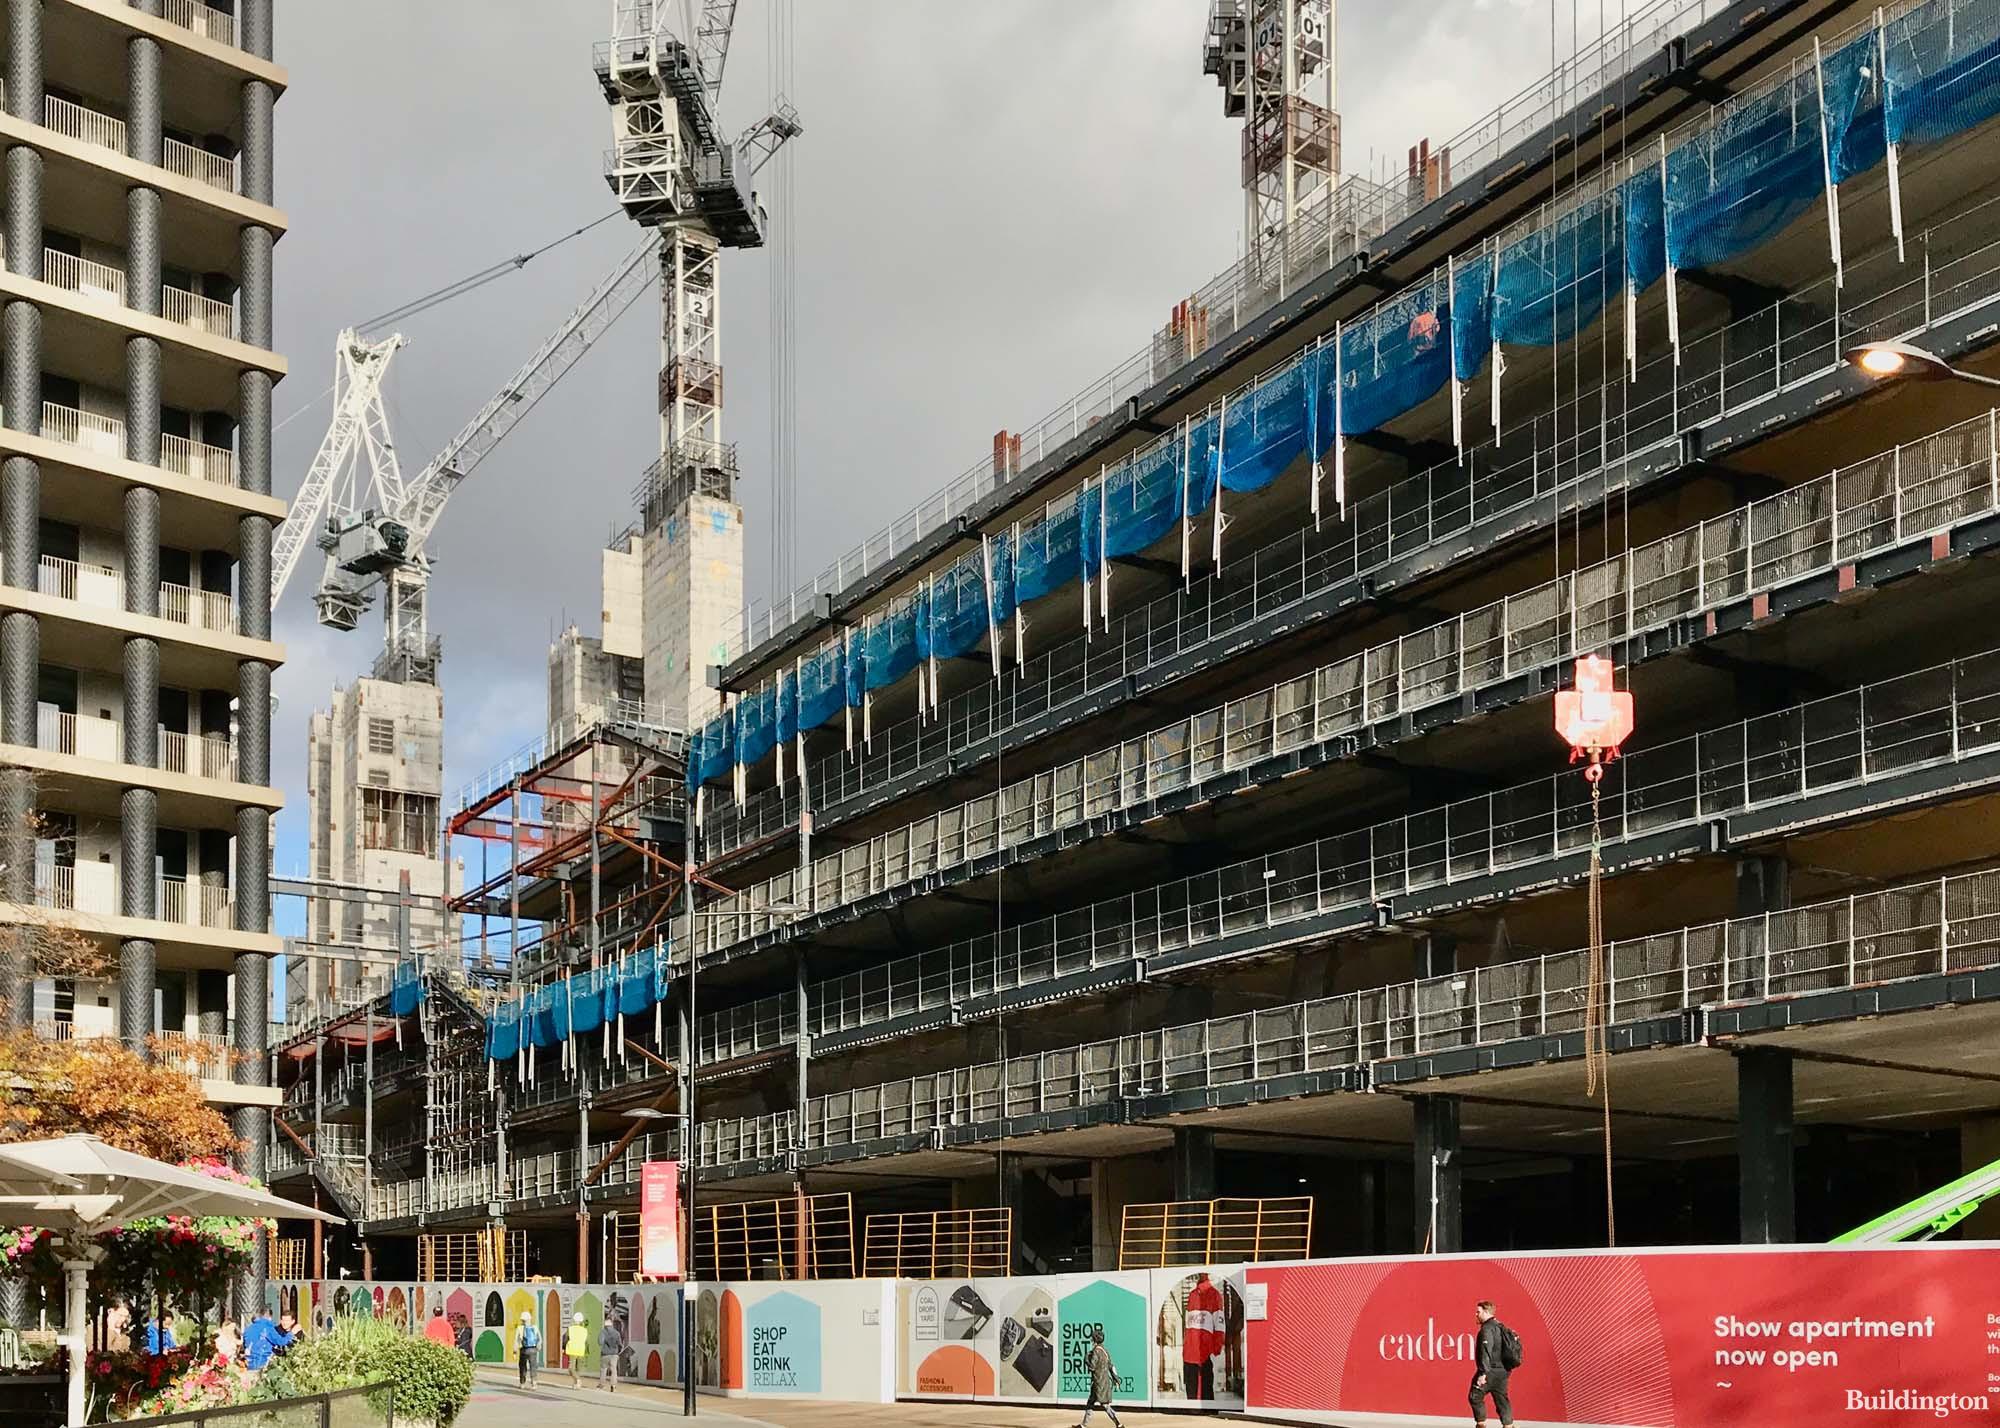 Google HQ under construction in King's Cross, London N1C.